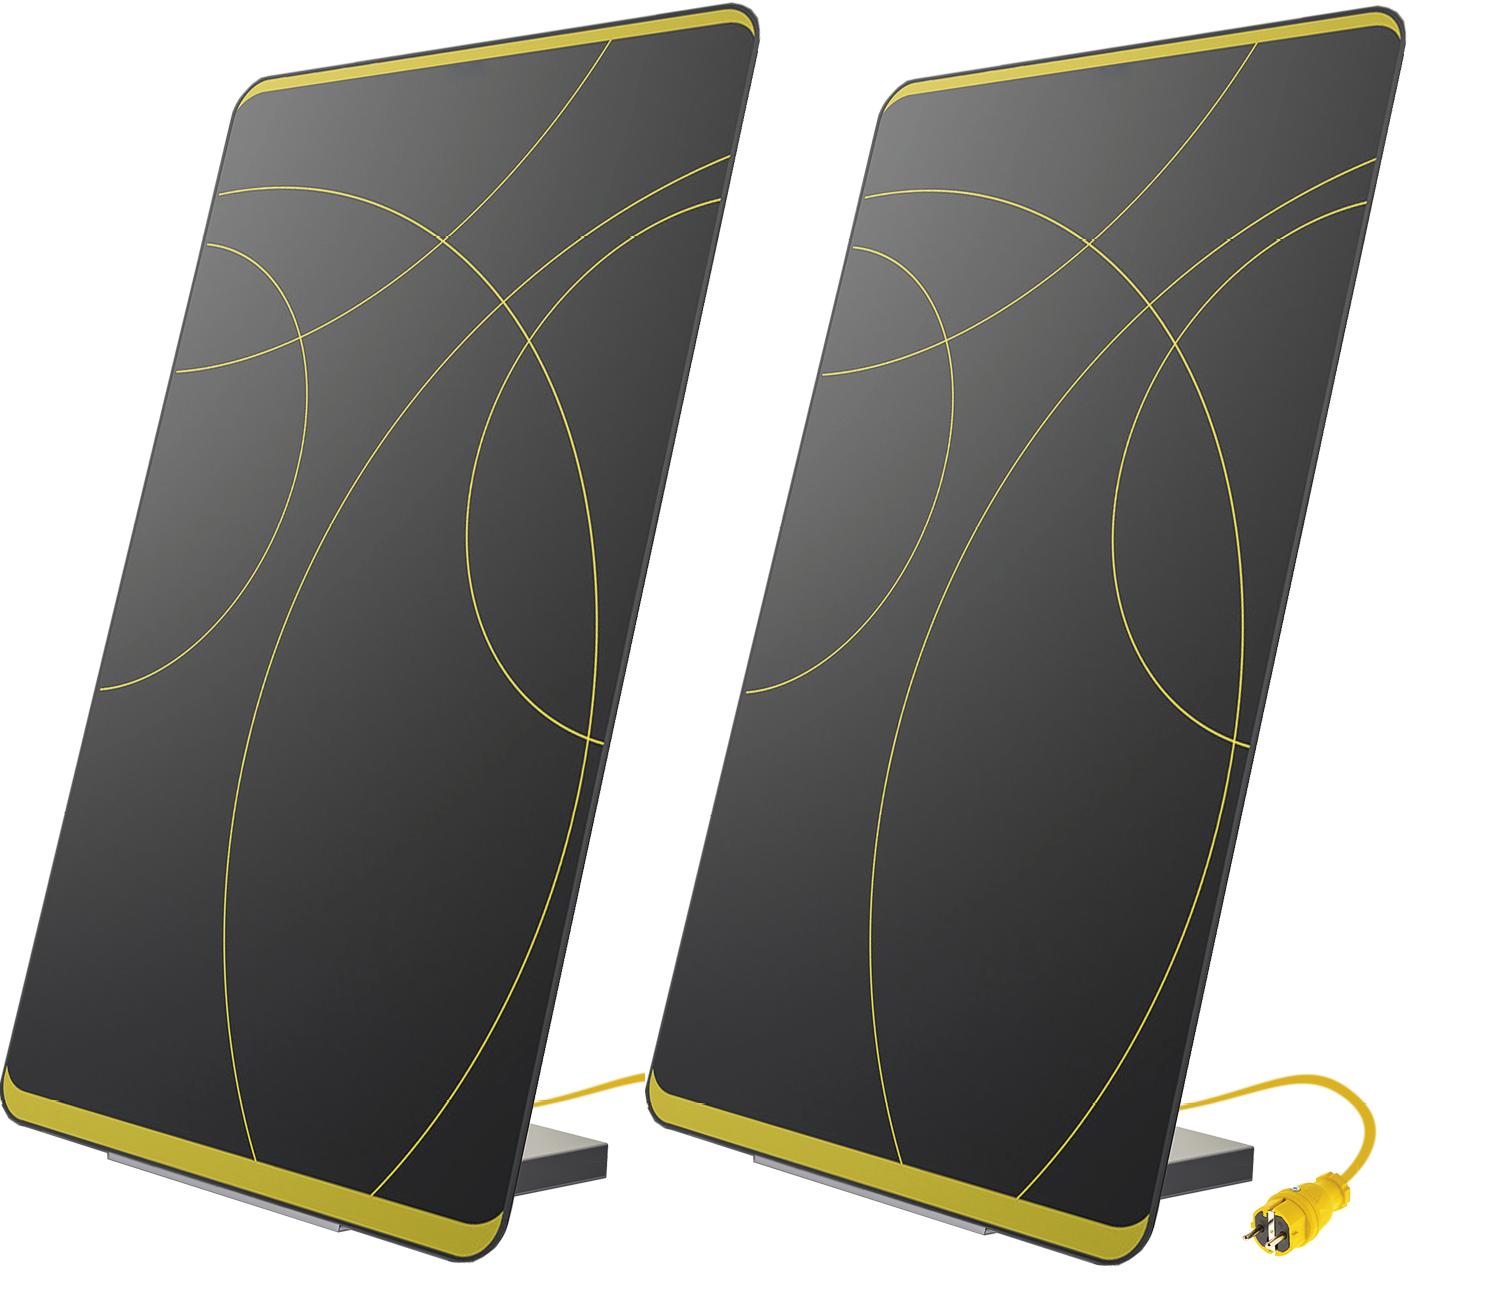 Doppelpack: 2 Plug-In Solarmodule MEIN KRAFTWERK - Design Edition